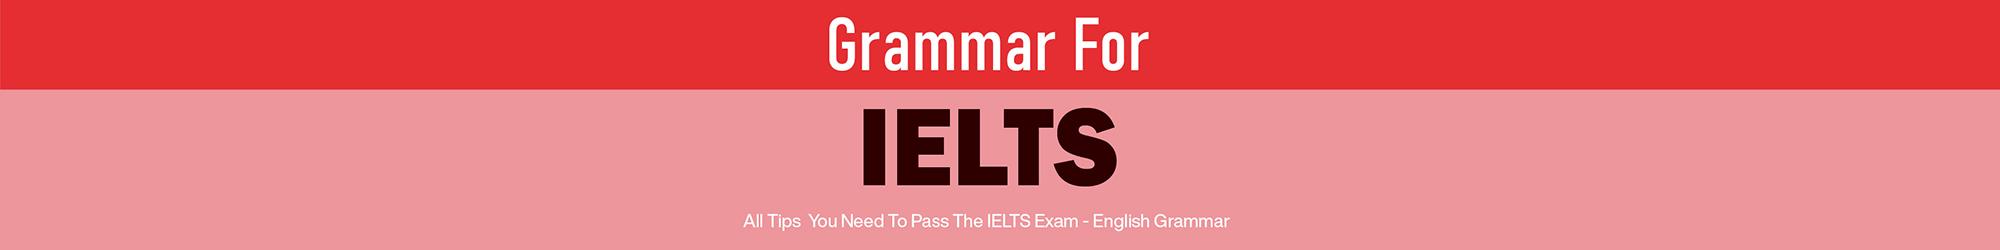 GRAMMAR FOR IELTS TEST banner